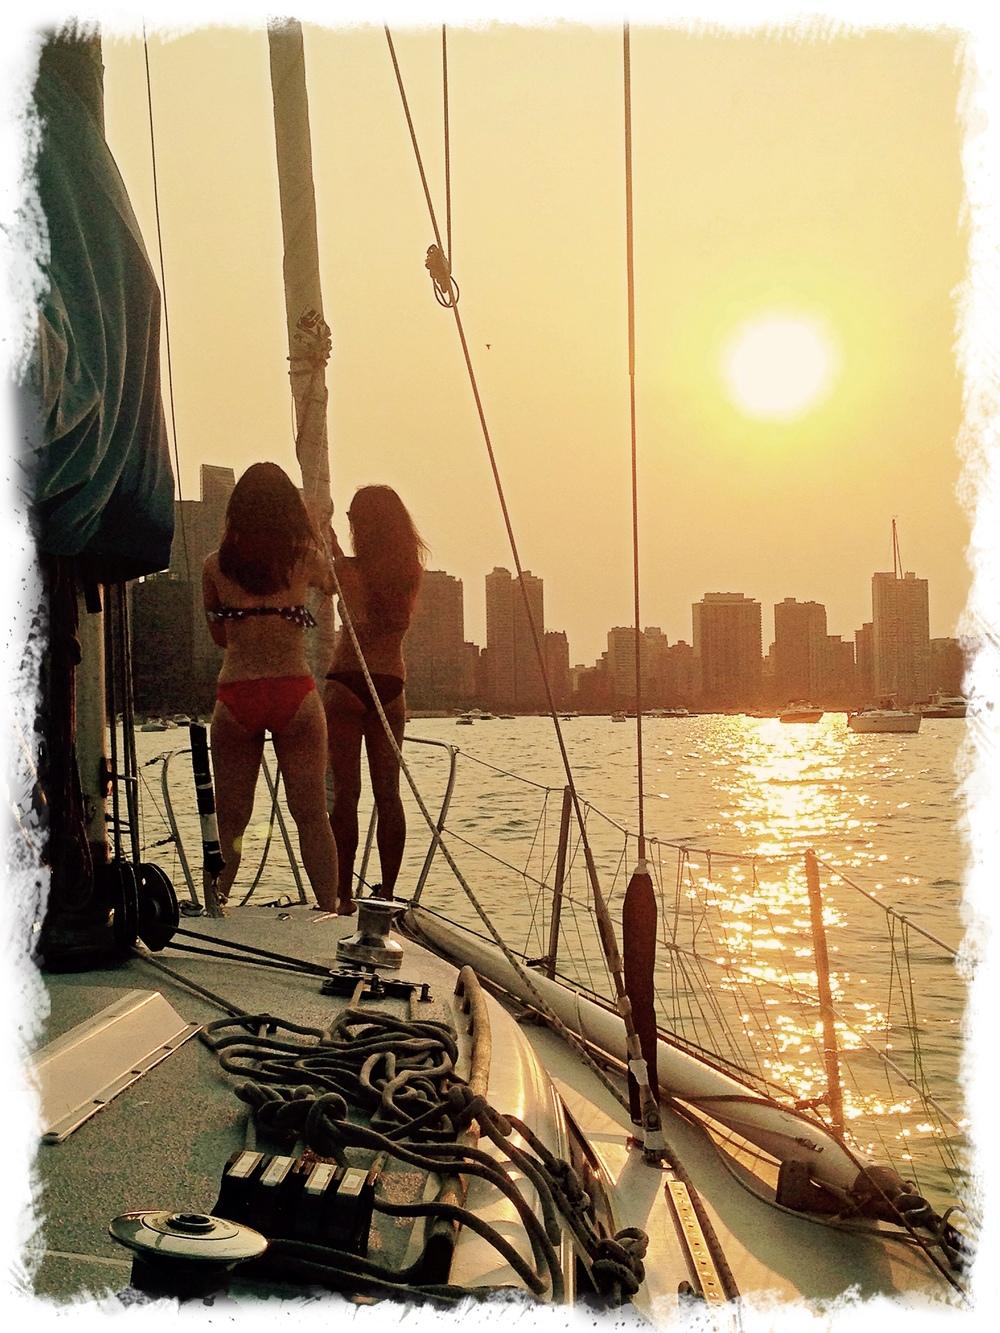 Salty Dog Sailing Chicago Charter Boat Tour July 4 2015_10.jpg